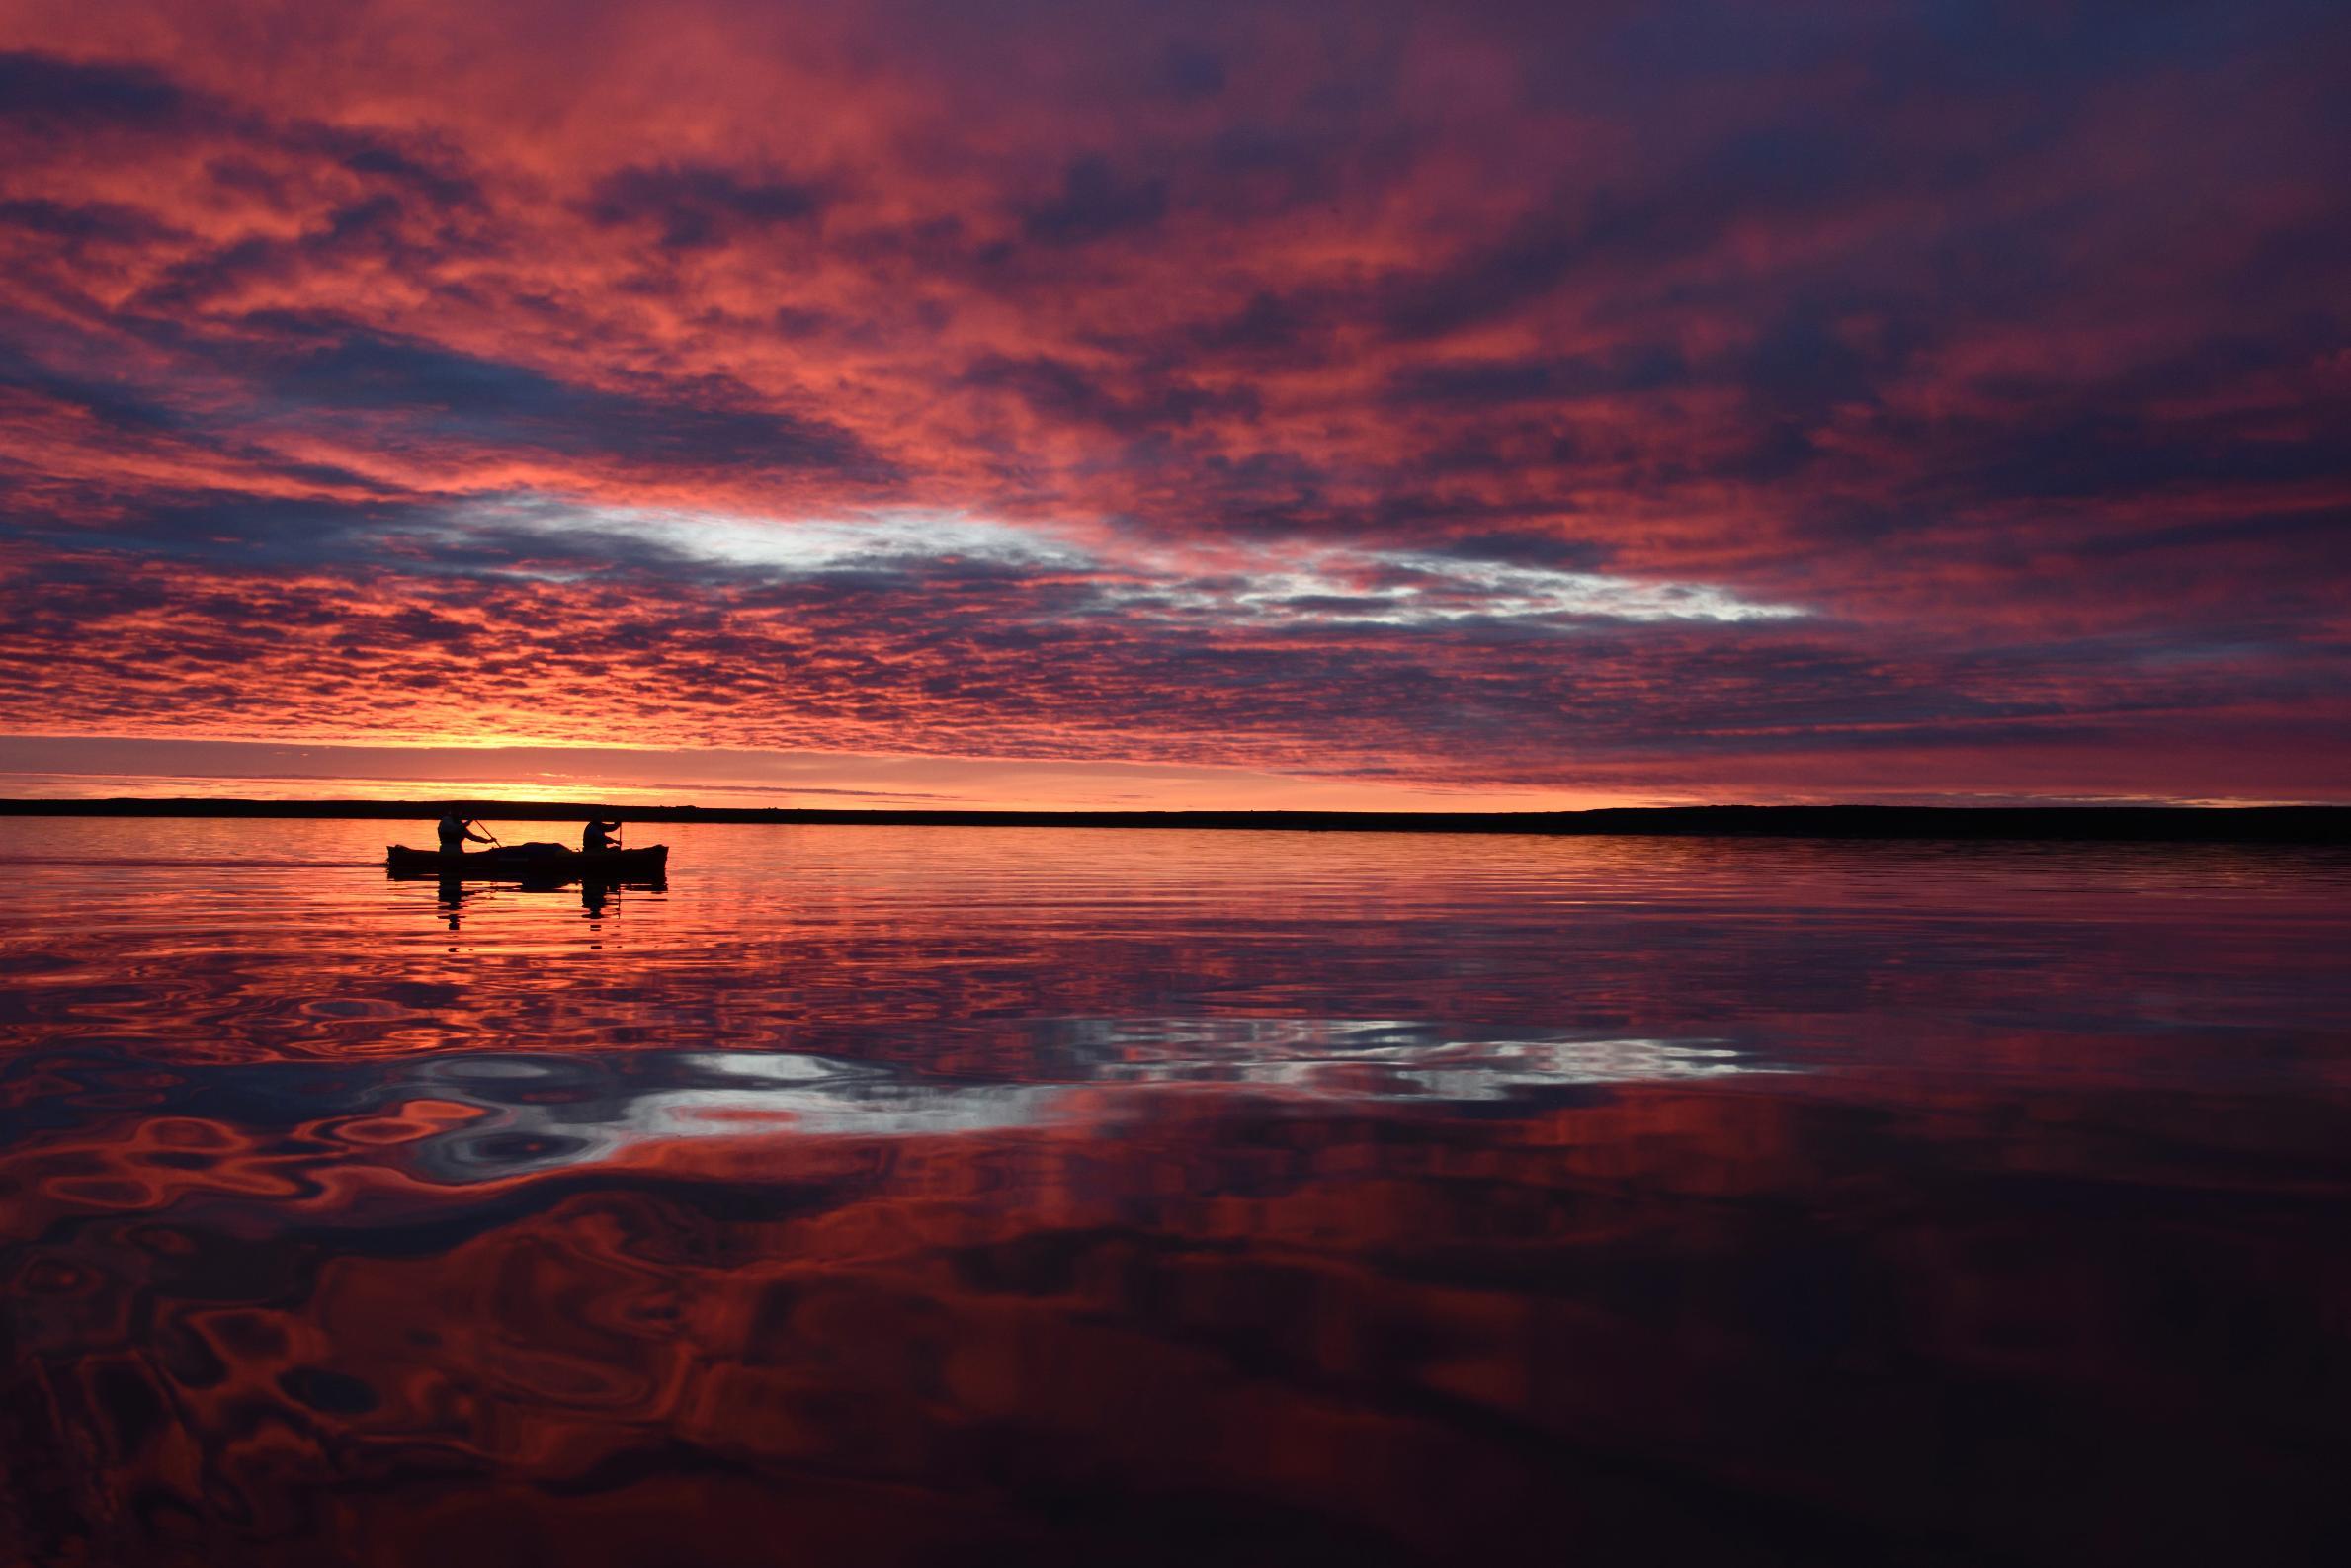 peacefull sunset 11:30PM